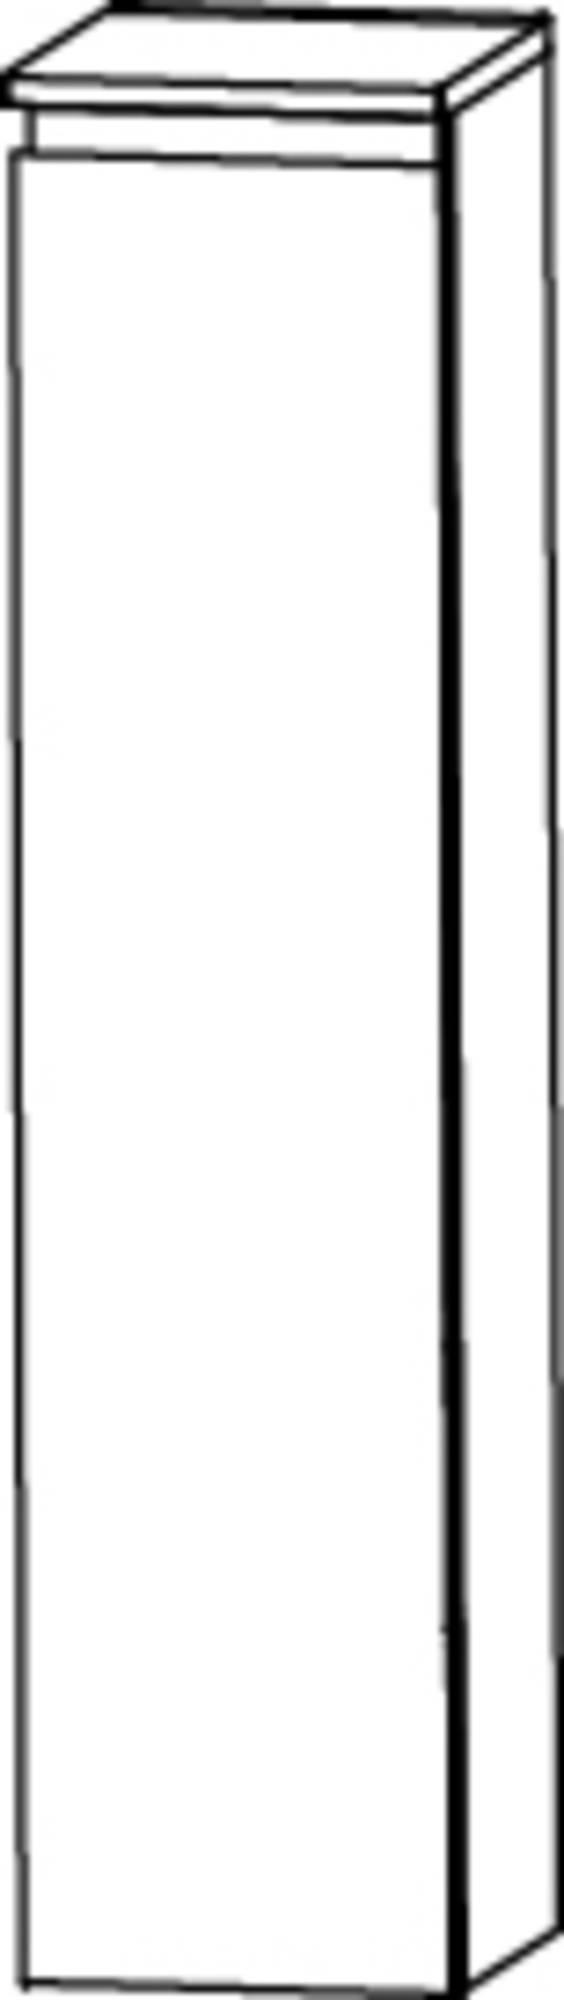 Saqu Pekka 3 Midikast rechts 30x32,5x113,6 cm Eiken Charleston